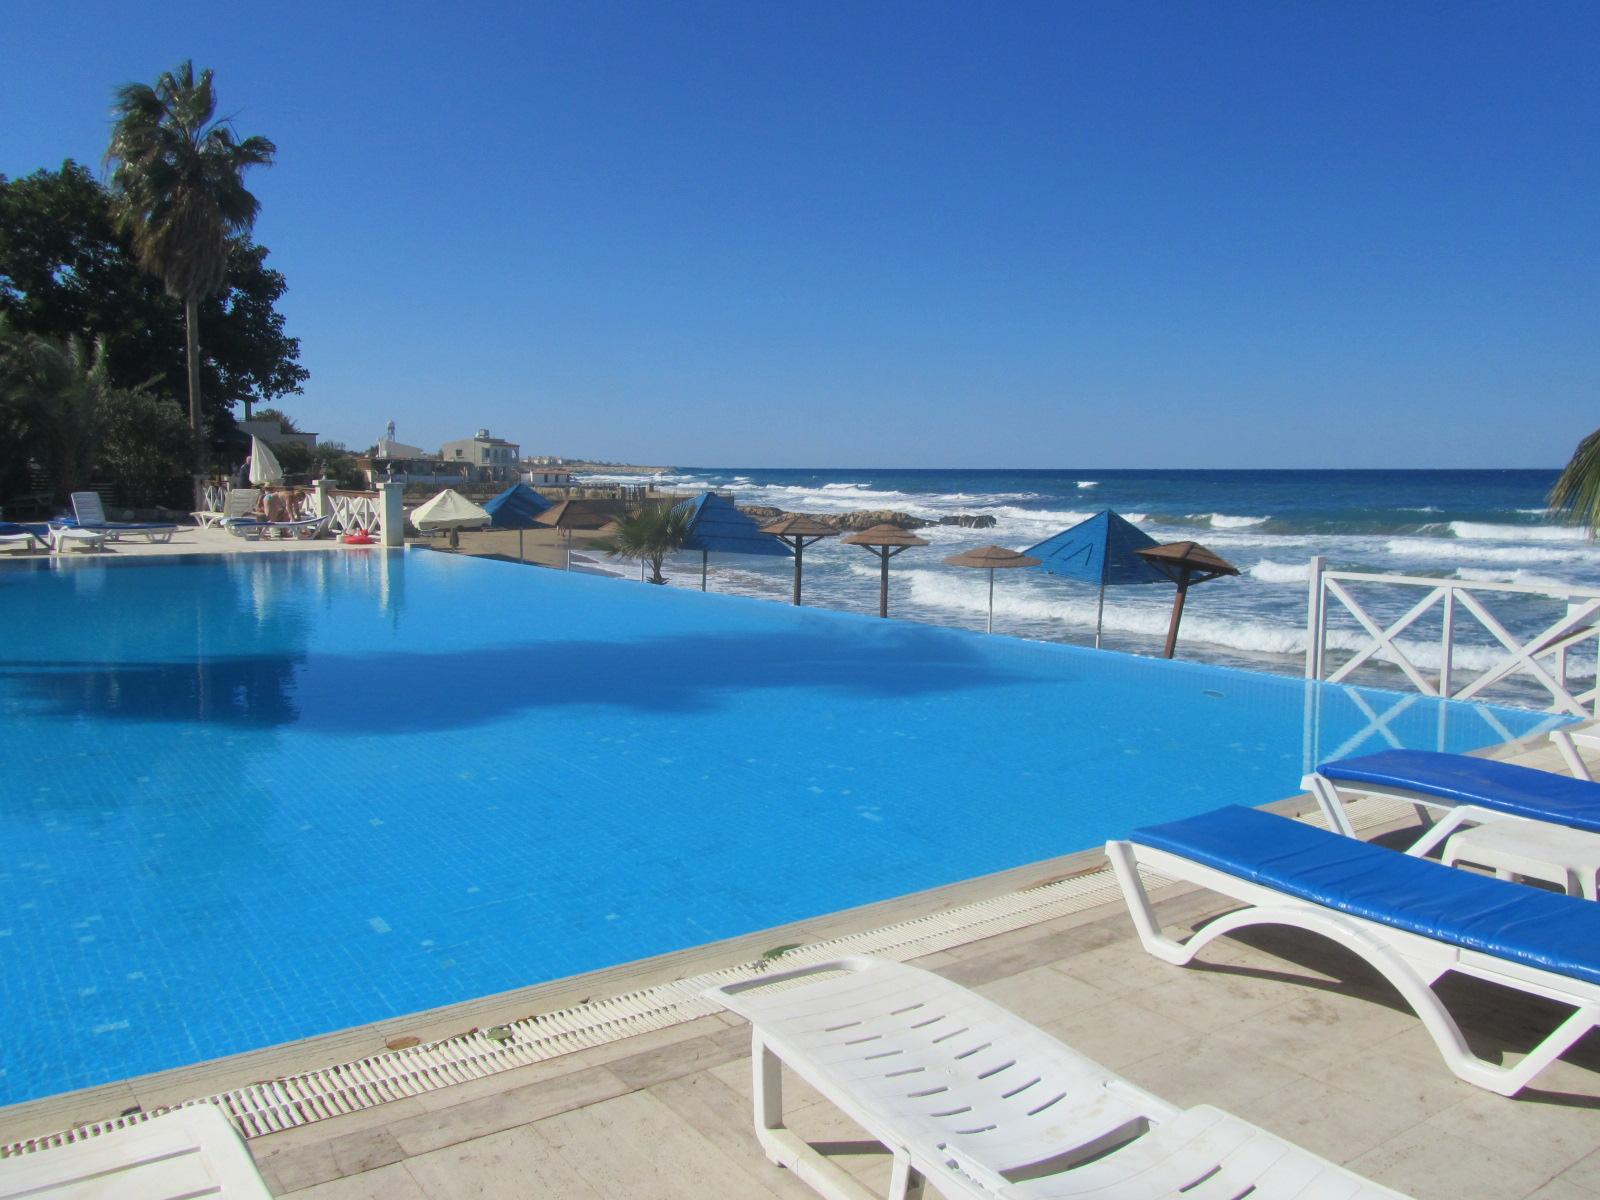 http://www.budavartours.hu/binaries//content/gallery/budavar/locations/accomodations/Ciprus/Kyrenia/L.A.+Beach+Resort/2013-oktober-084.jpg